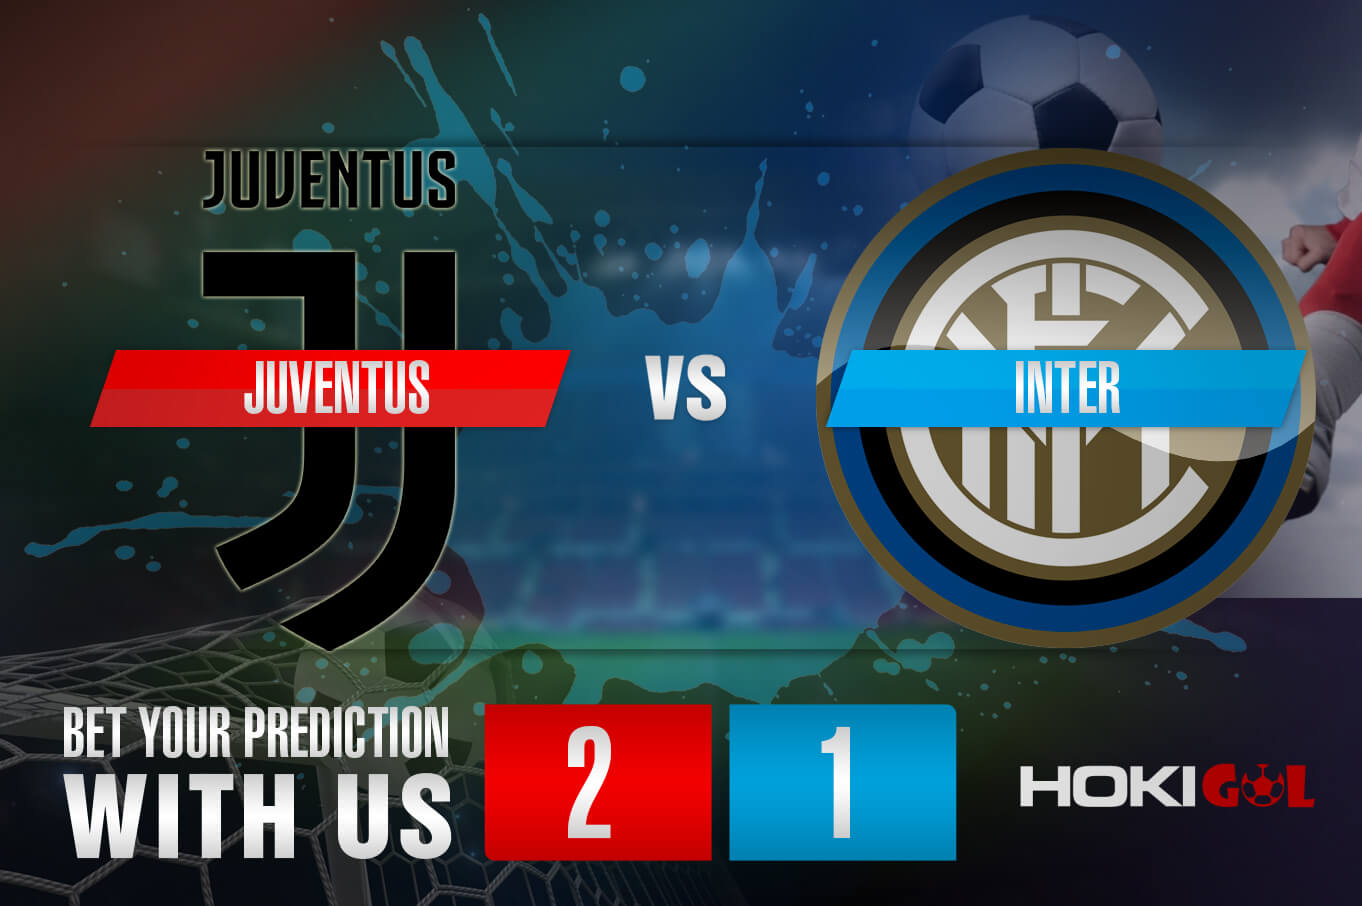 Prediksi Bola Juventus Vs Inter 10 Februari 2021